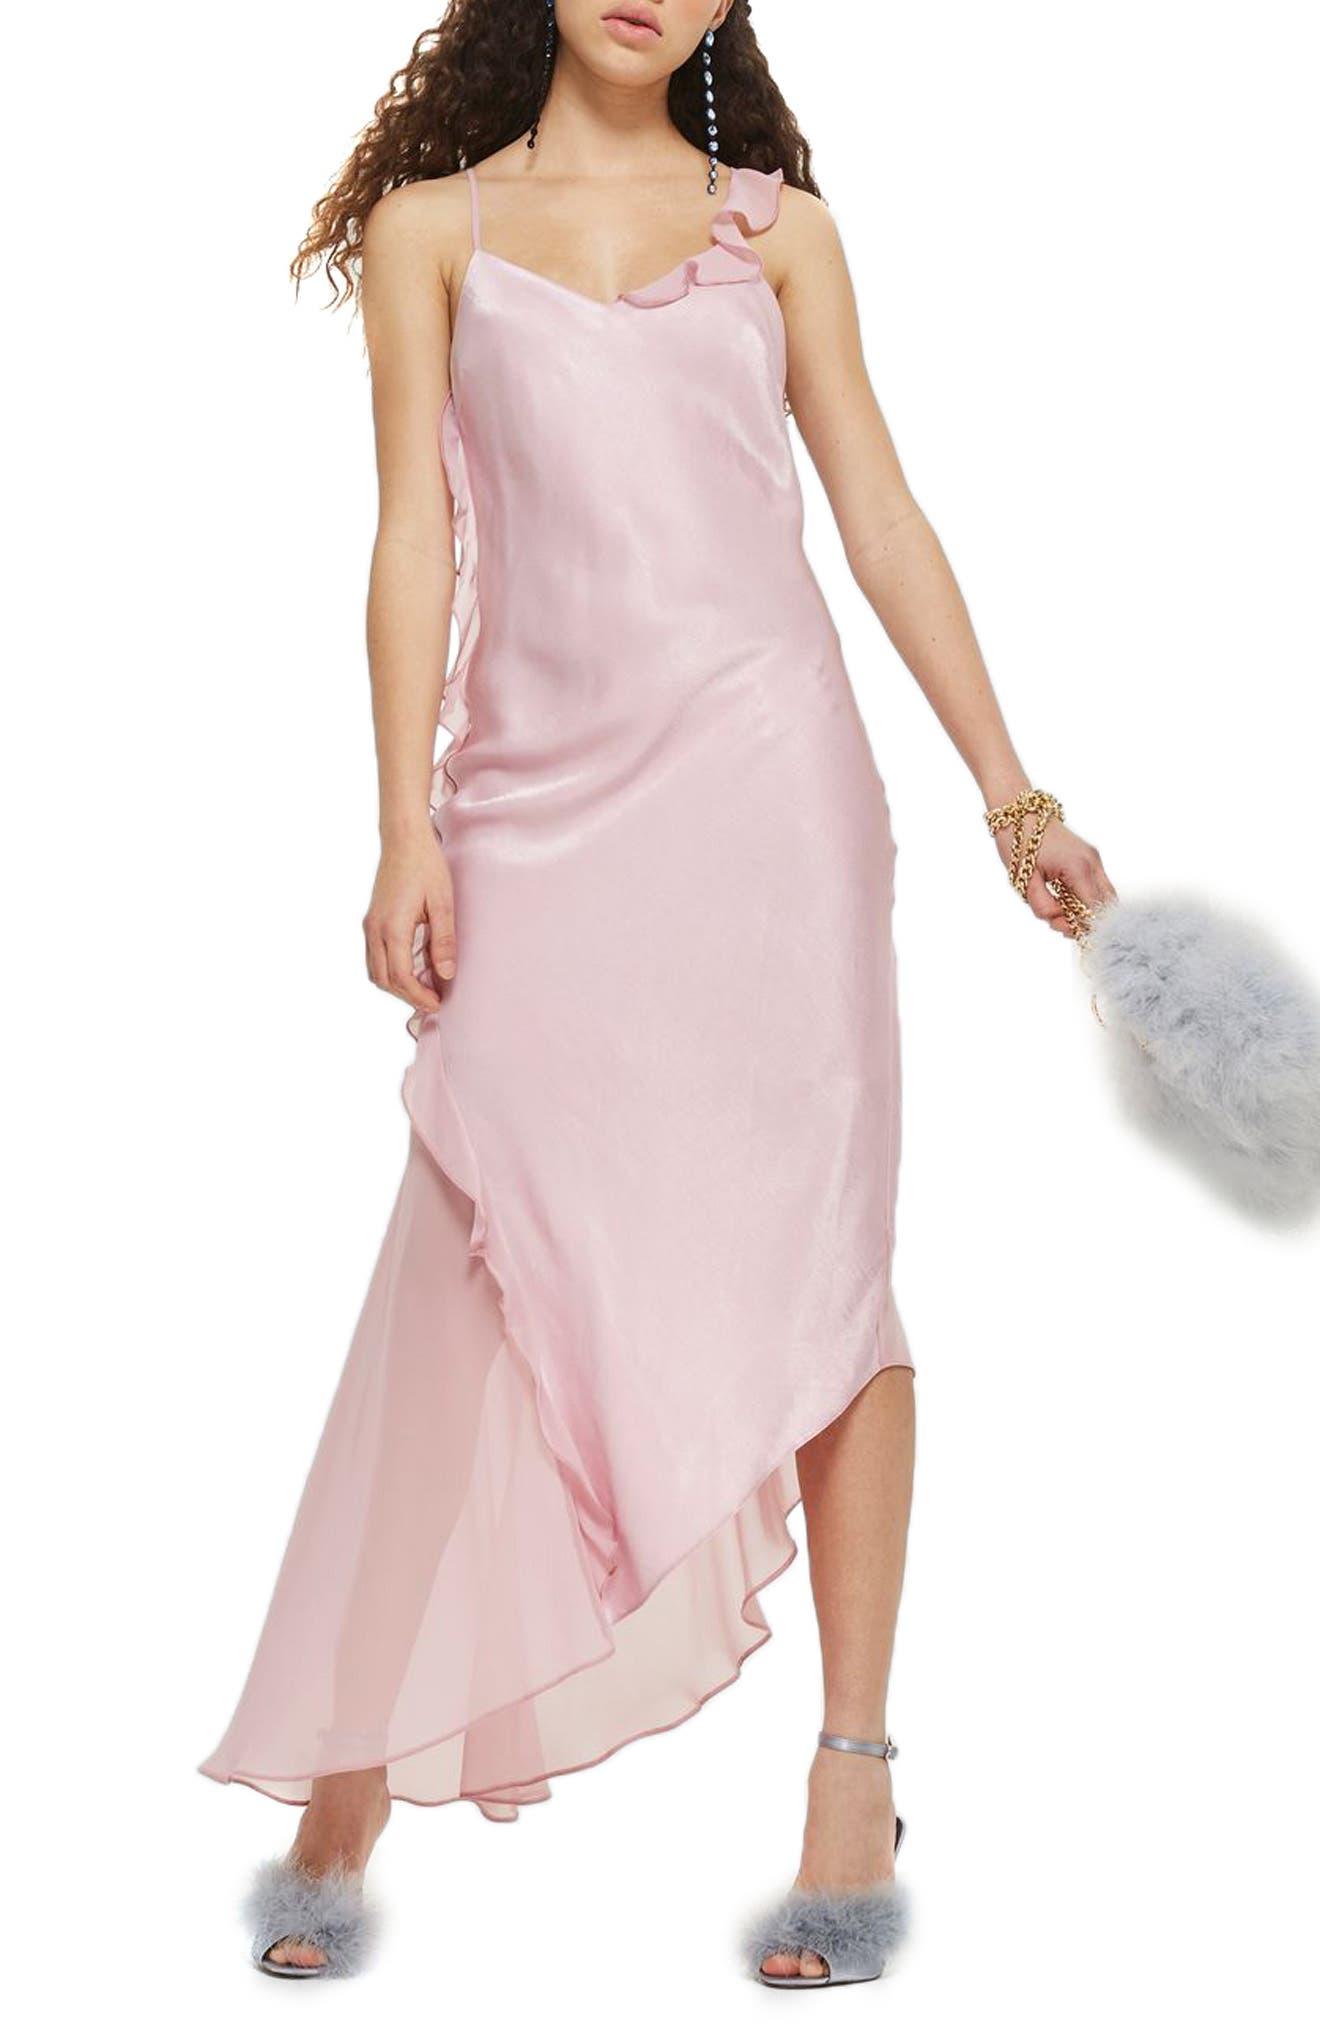 Topshop Asymmetrical Frill Maxi Dress